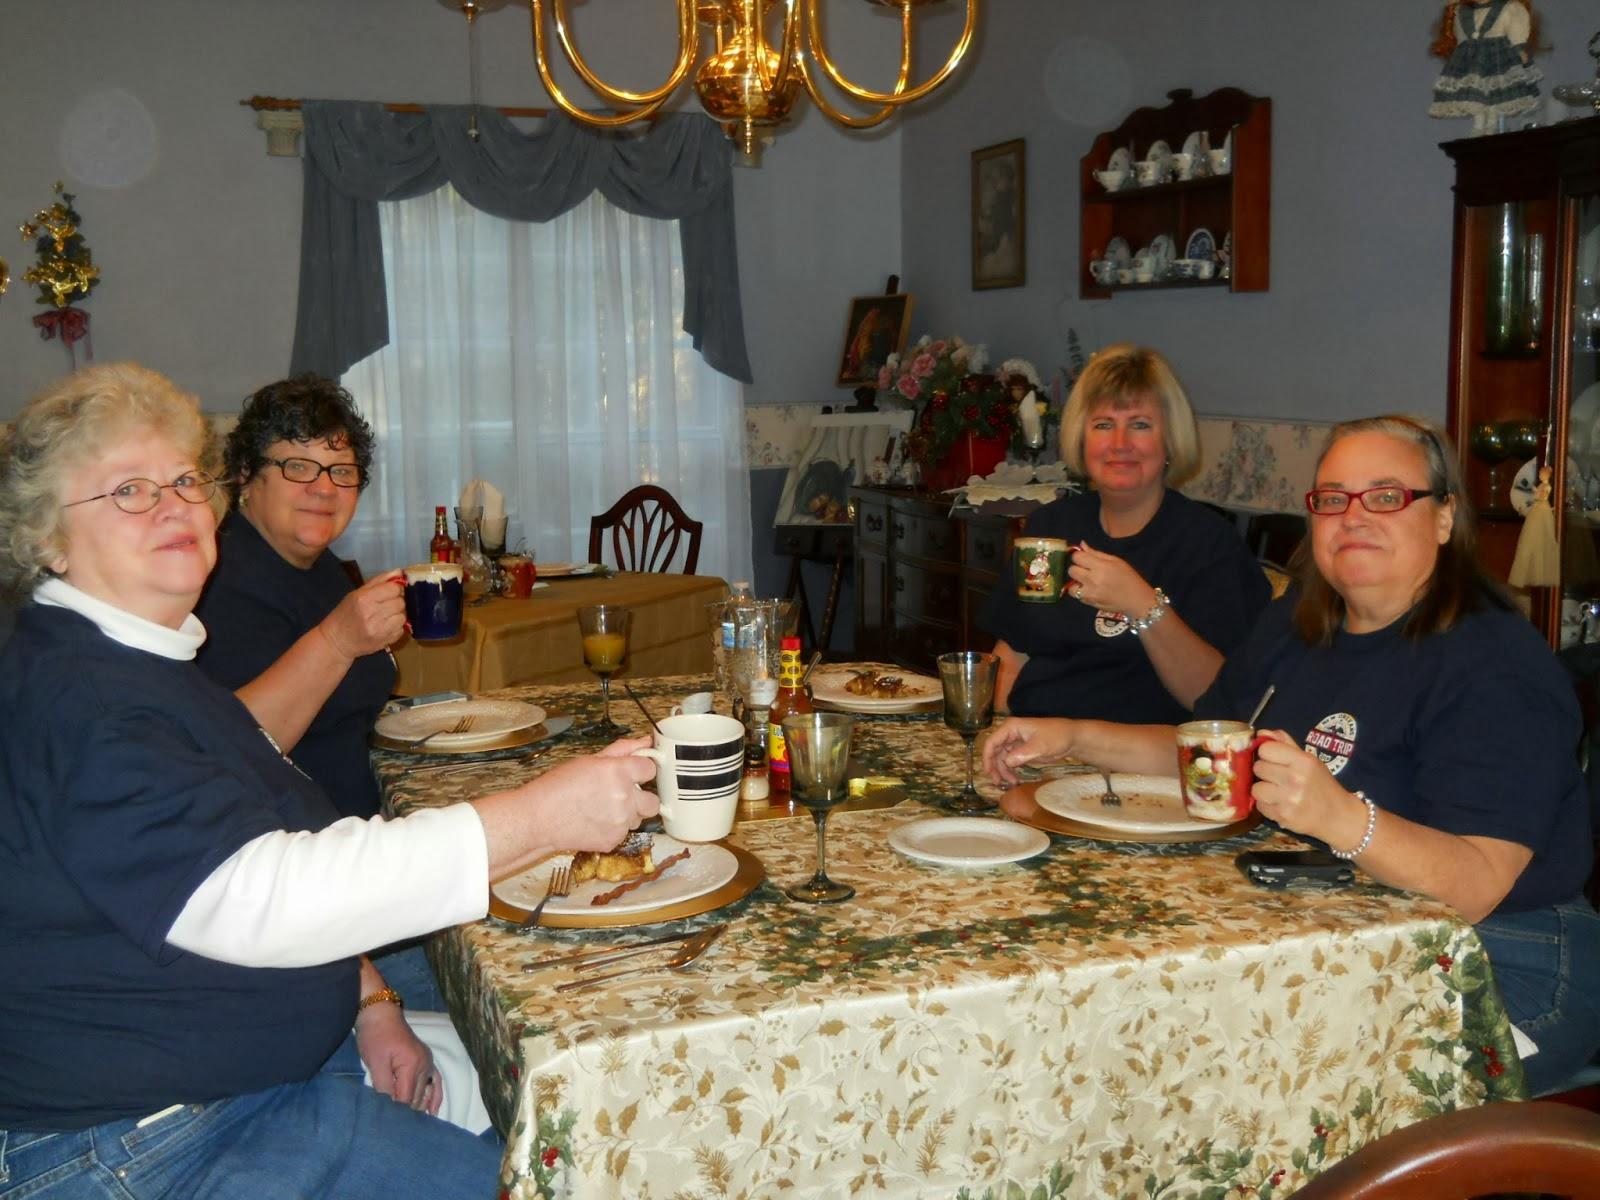 Innjoying breakfast at Woodridge B&B in Louisiana